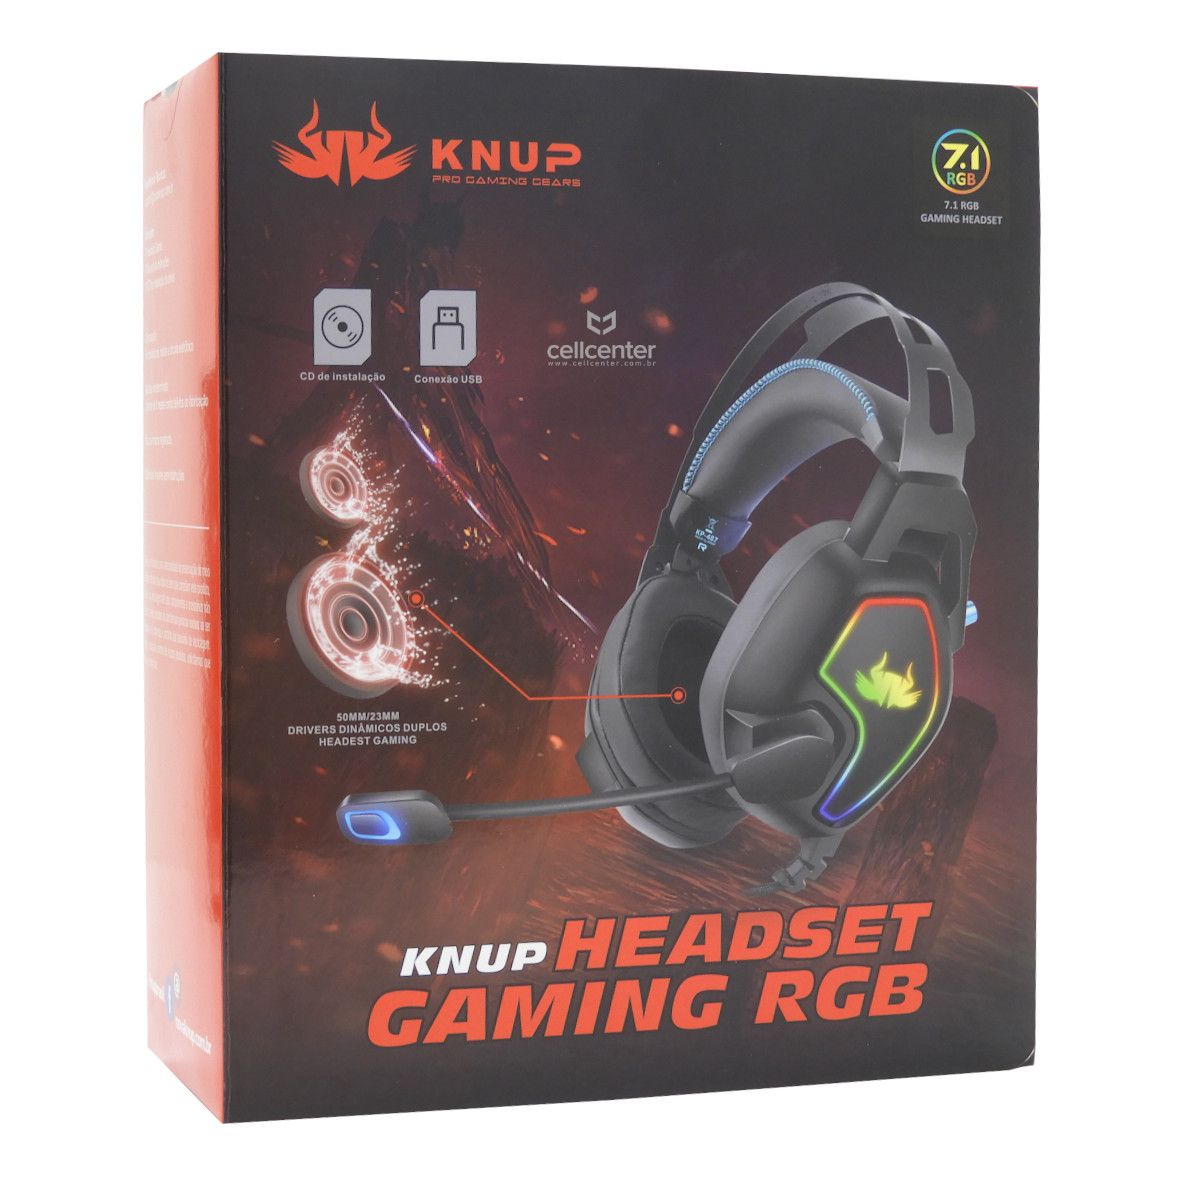 Headset Fone De Ouvido Gamer 7.1 USB LEDs Knup Pc Kp-487